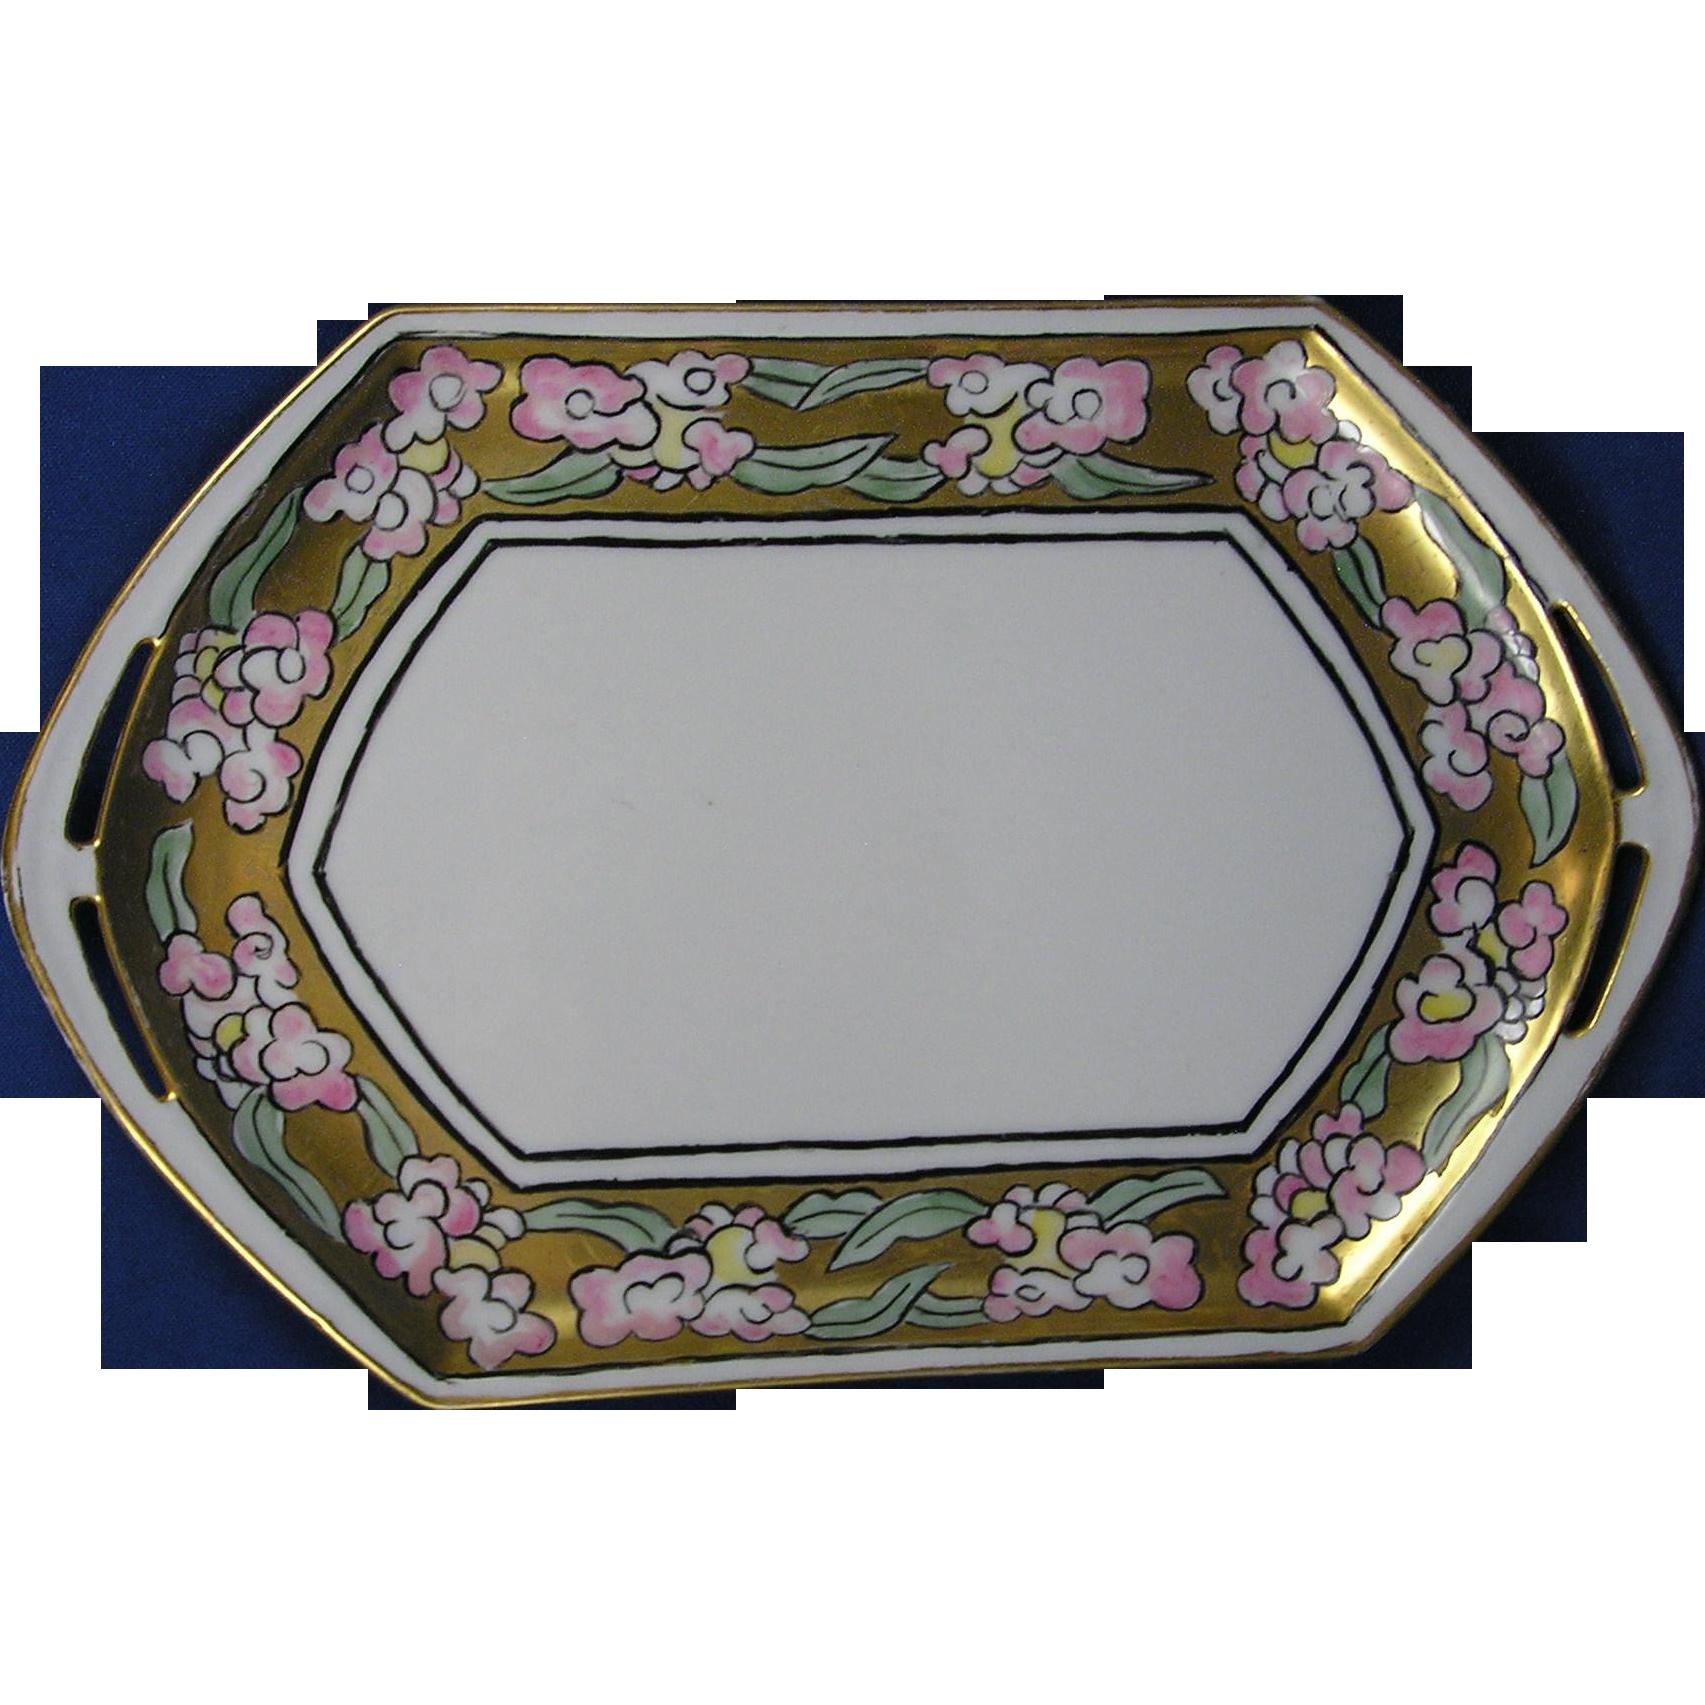 Moritz Zdekauer (MZ) Austria Arts & Crafts Pink Floral Motif Tray (c.1884-1909)